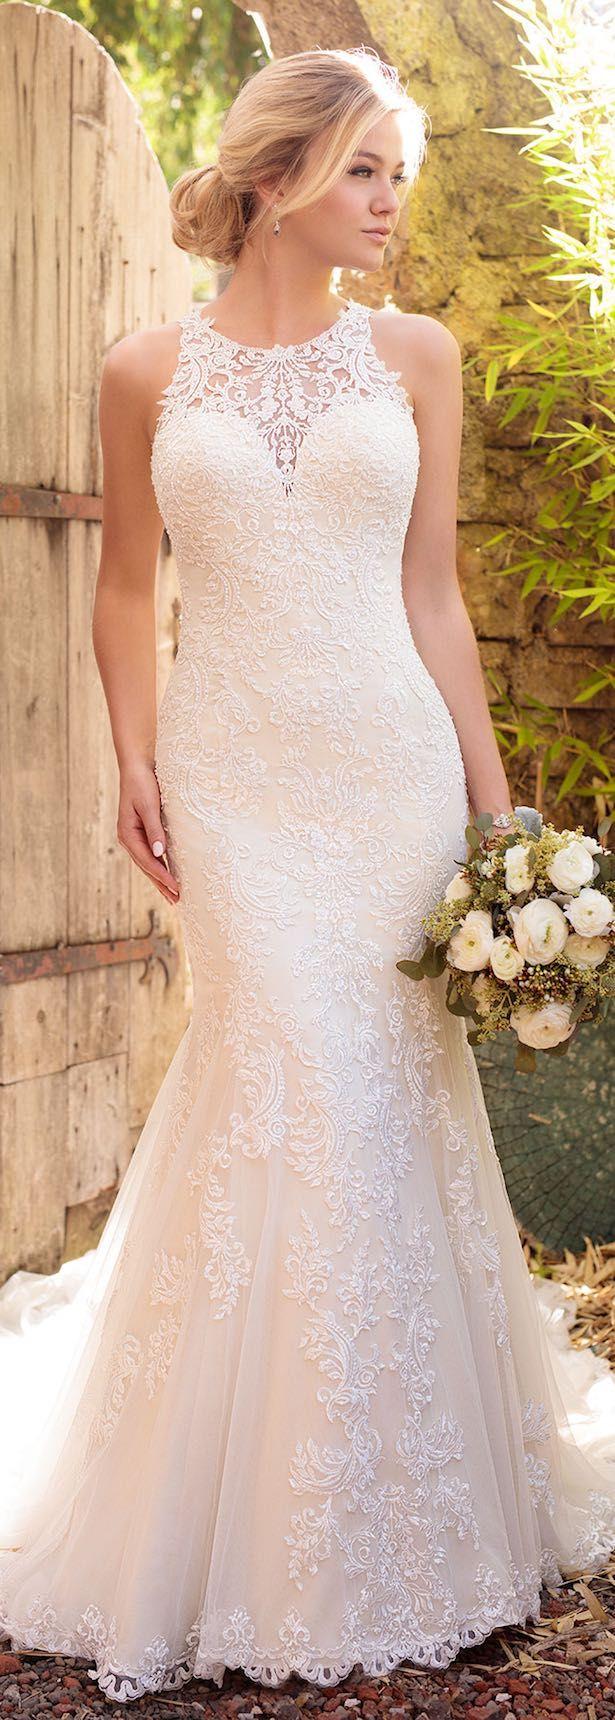 Flattering wedding dresses for plus size  Essense of Australia Fall    wedding dresses Fall  and